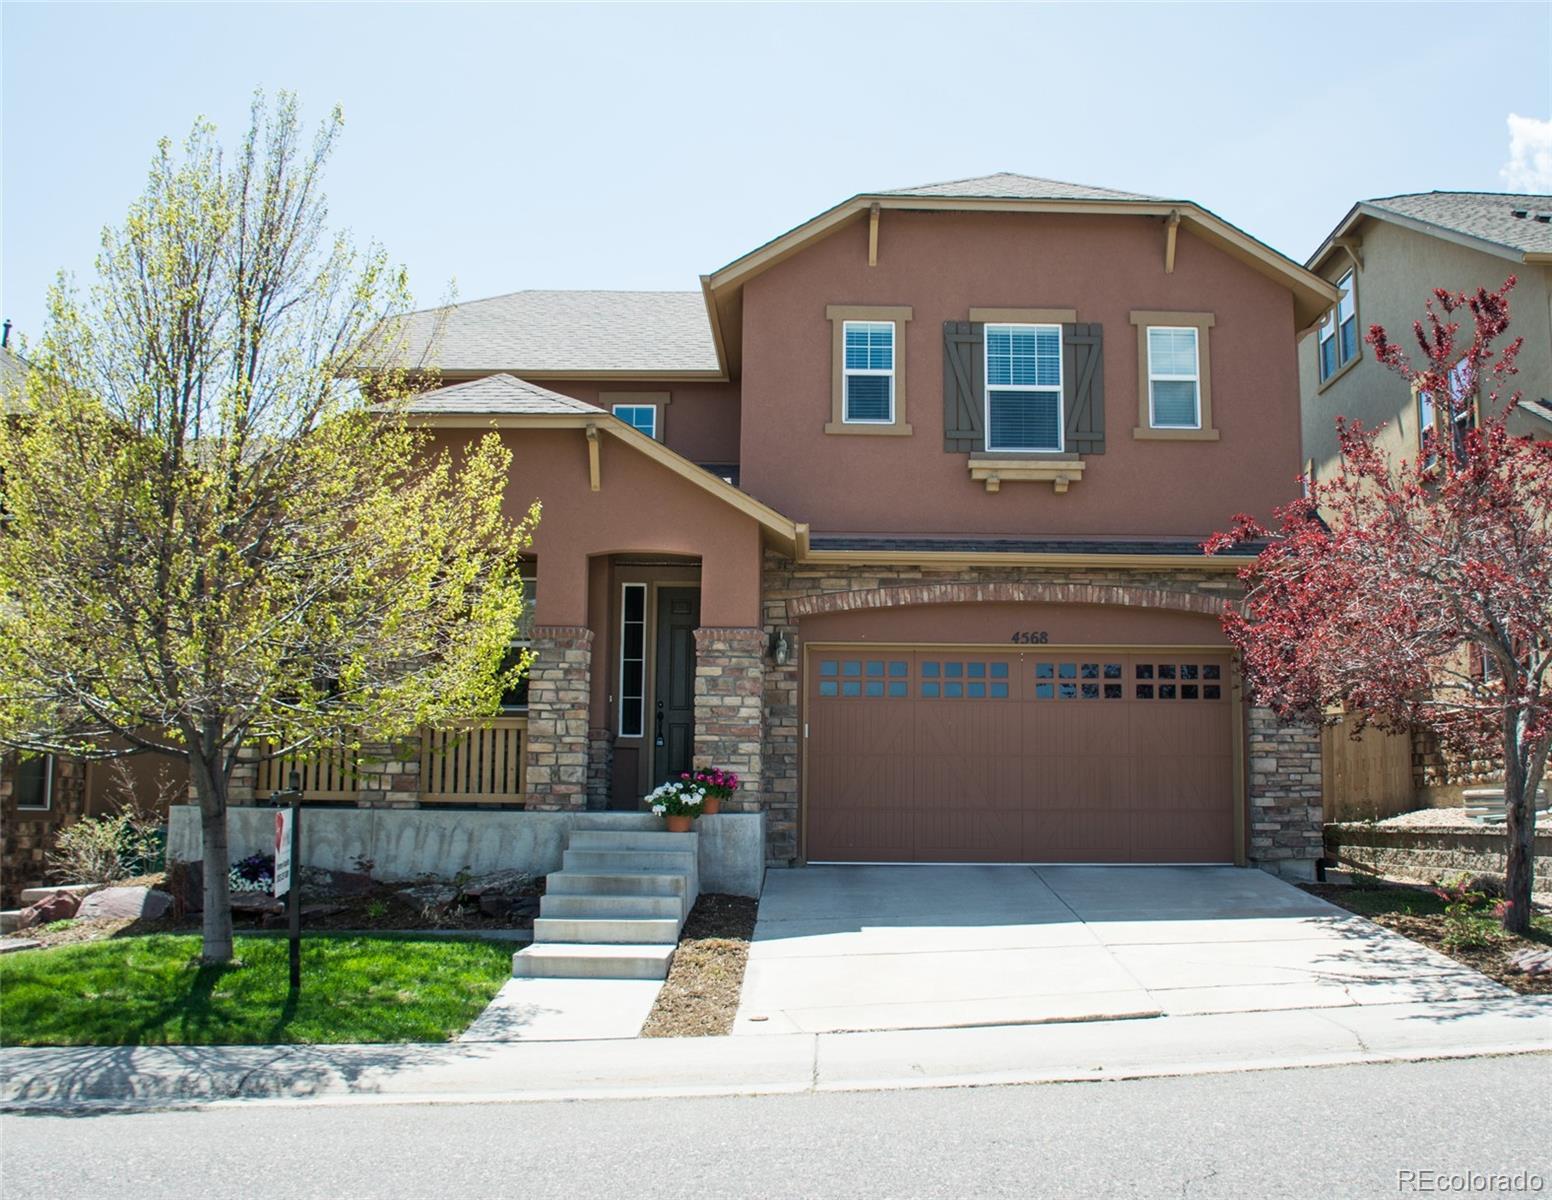 MLS# 6747511 - 3 - 4568 Valleybrook Drive, Highlands Ranch, CO 80130